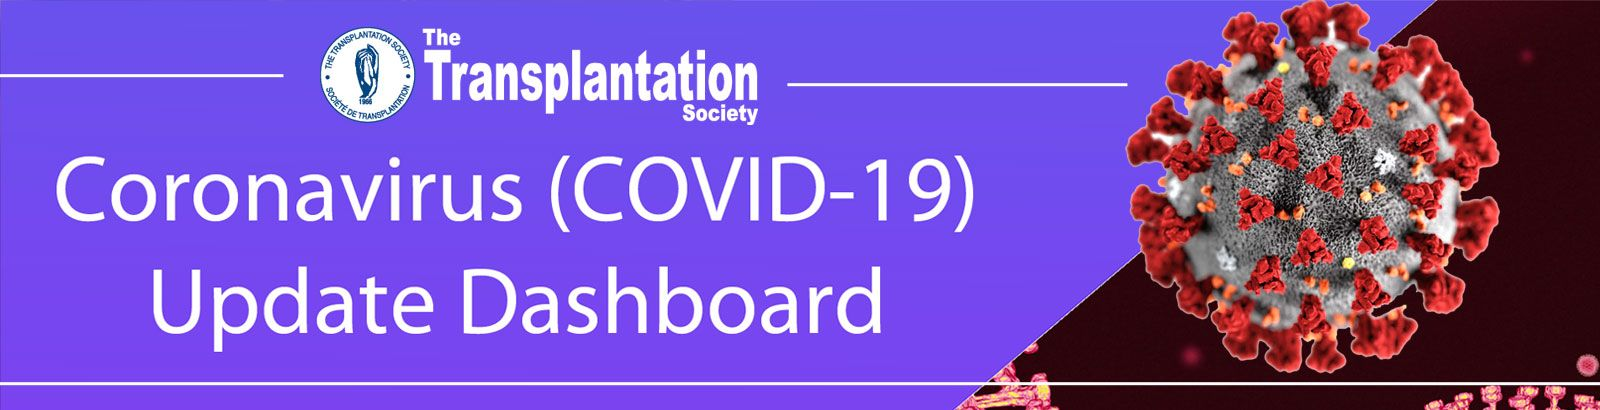 Coronavirus Dashboard Covid 19